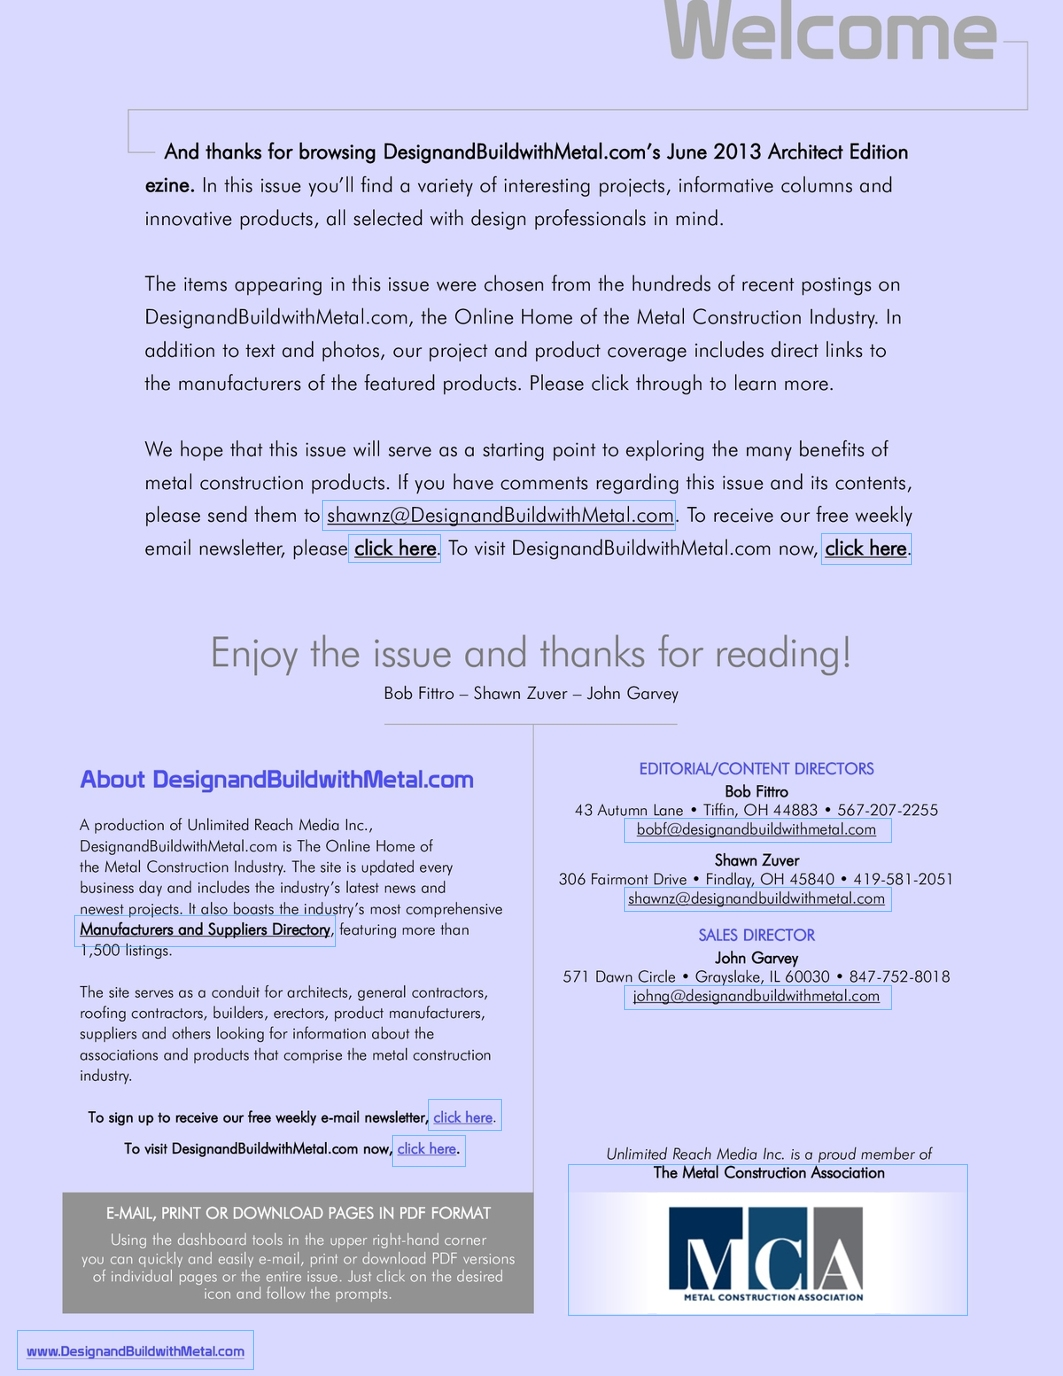 DesignandBuildwithMetal com Architect Edition June 2013